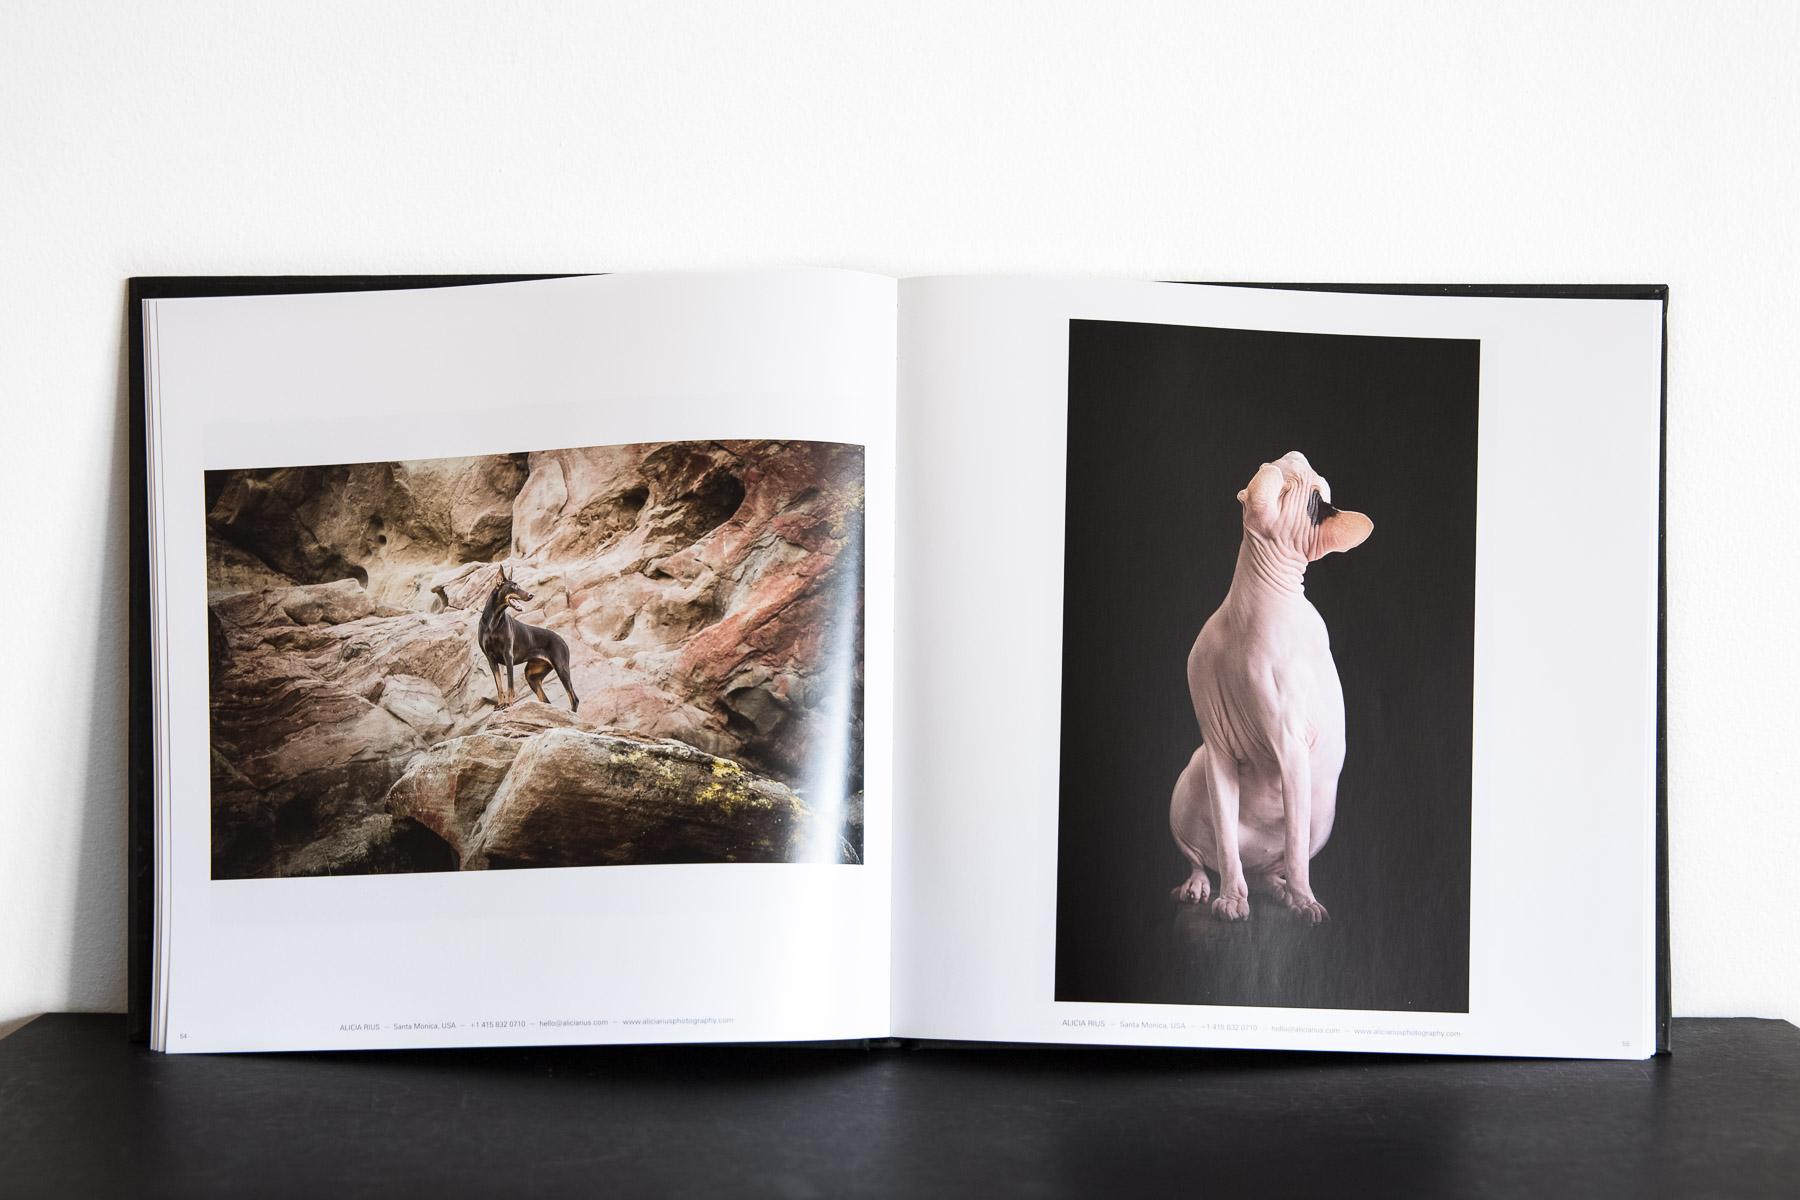 The two winning images. On the left: Dakota, the Doberman. On the right: Delilah, the Sphynx cat.